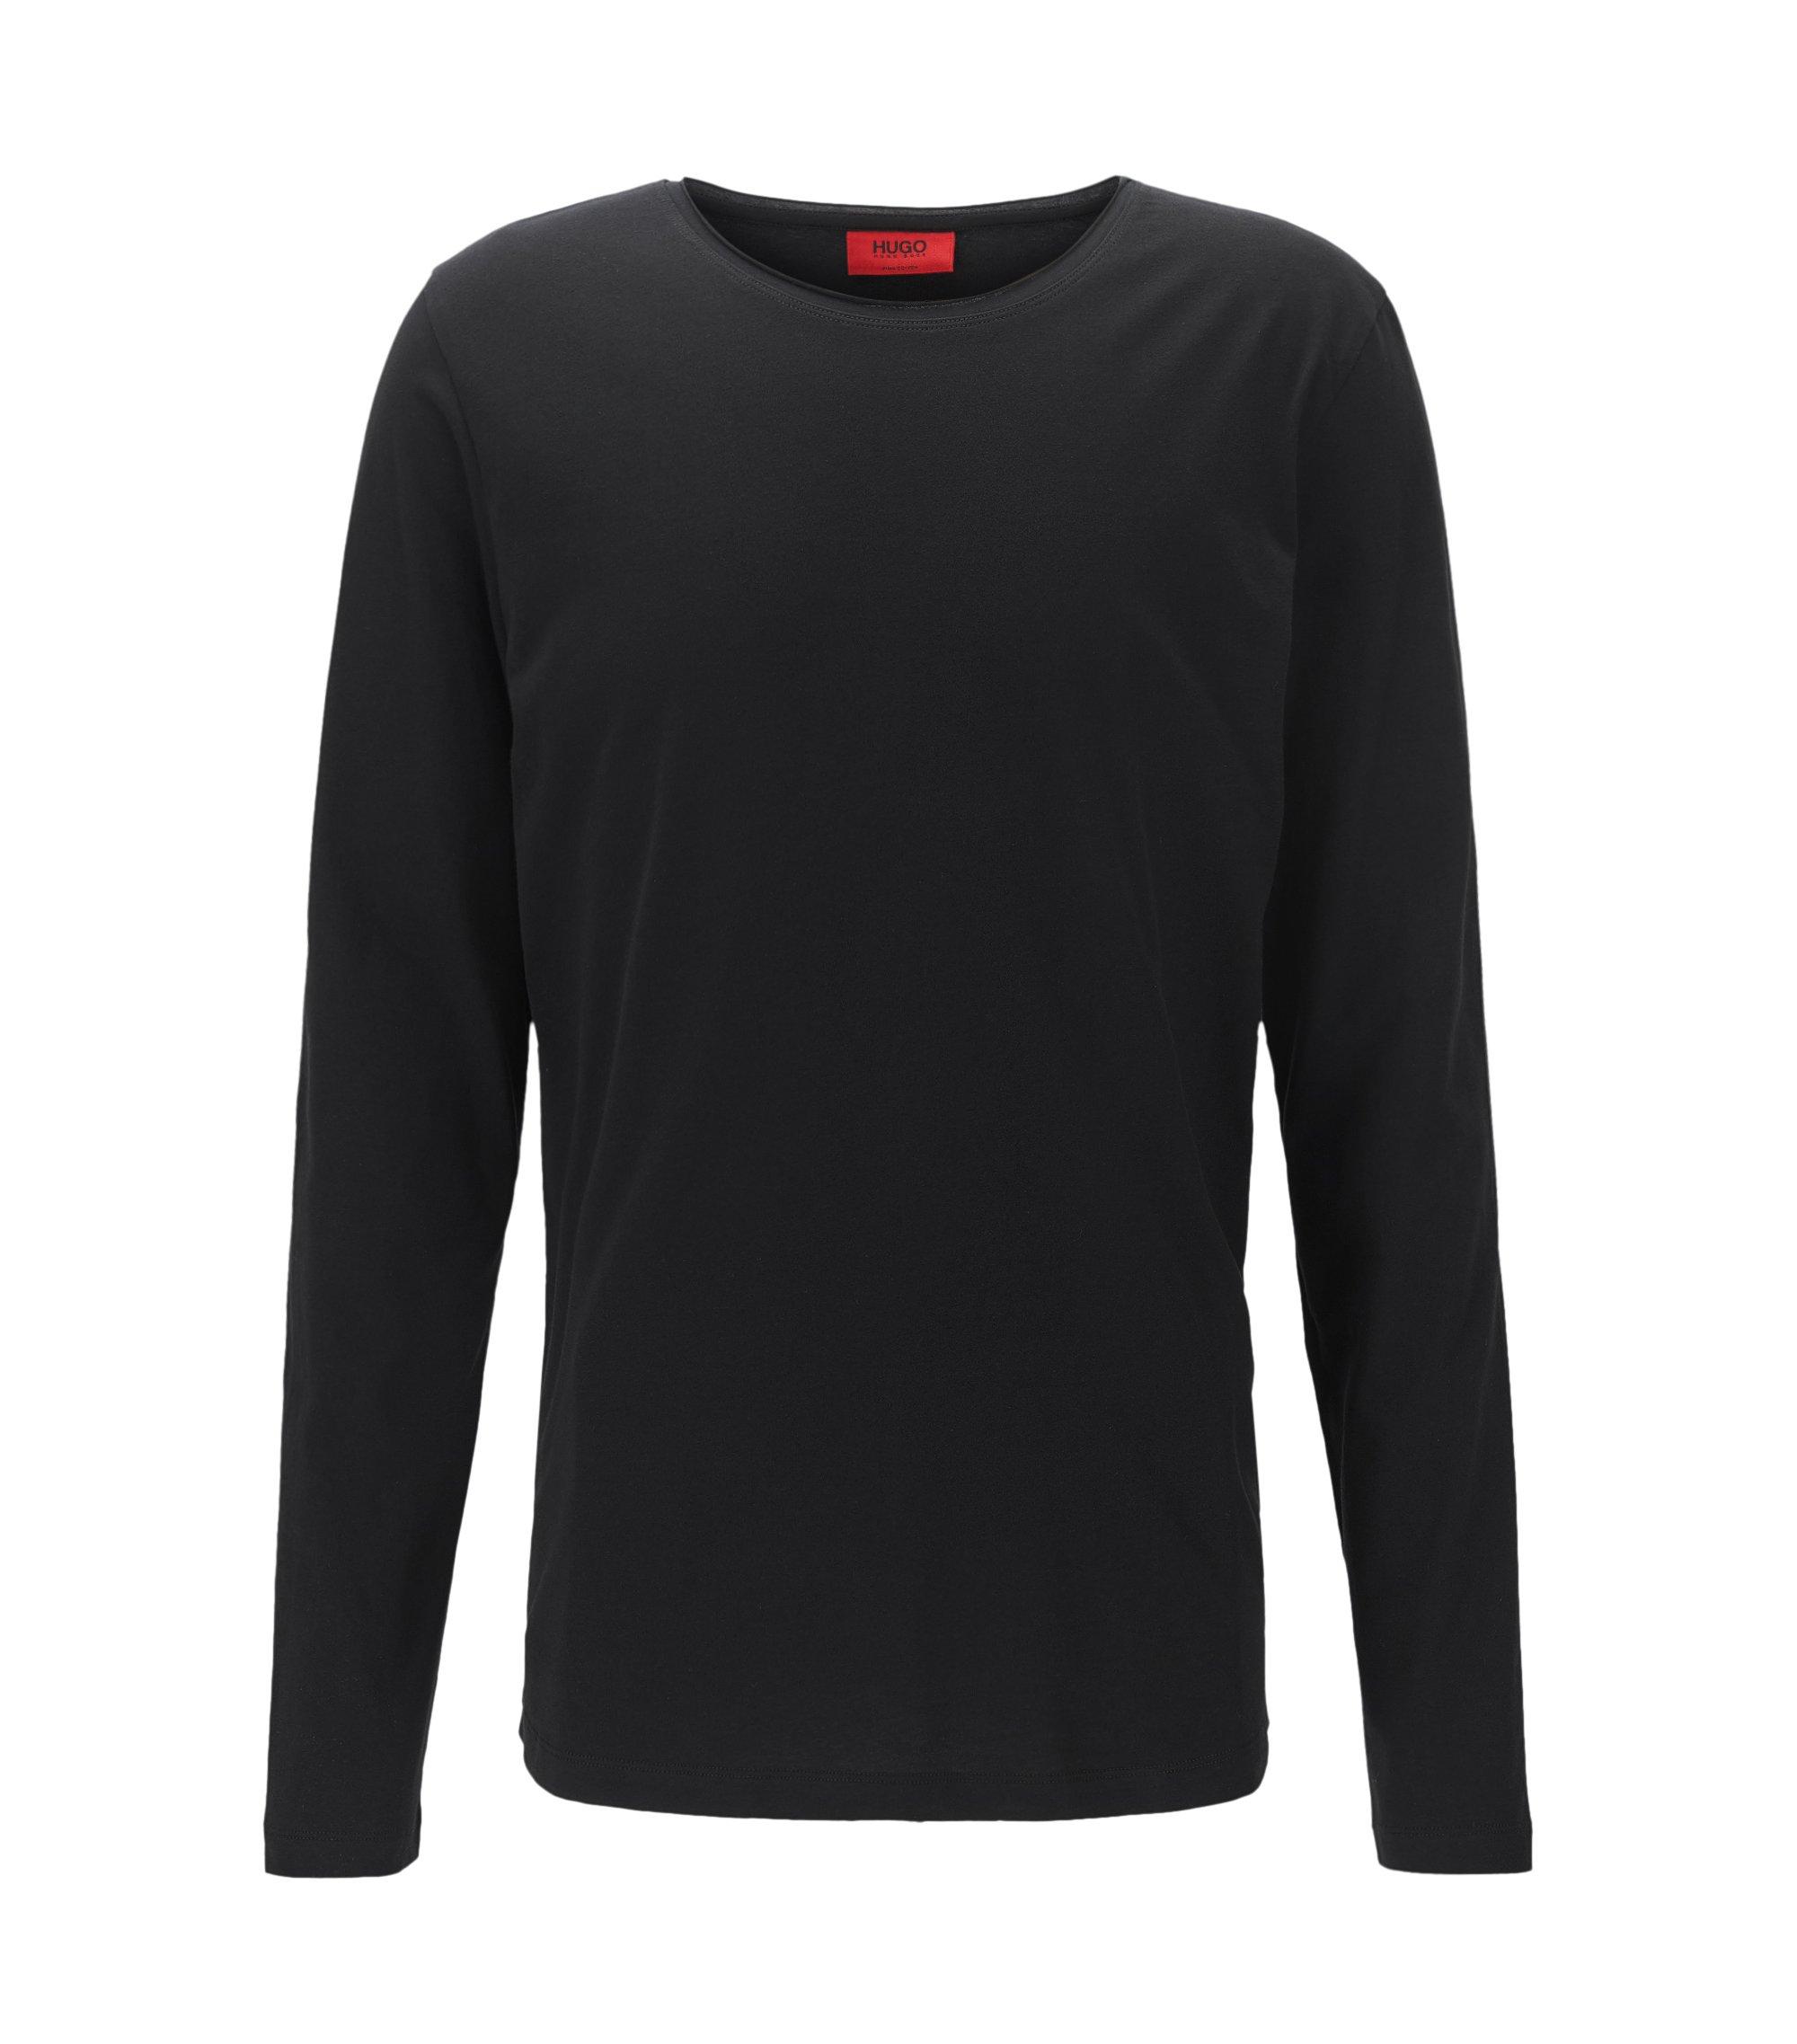 Camiseta relaxed fit de manga larga en algodón supima, Negro